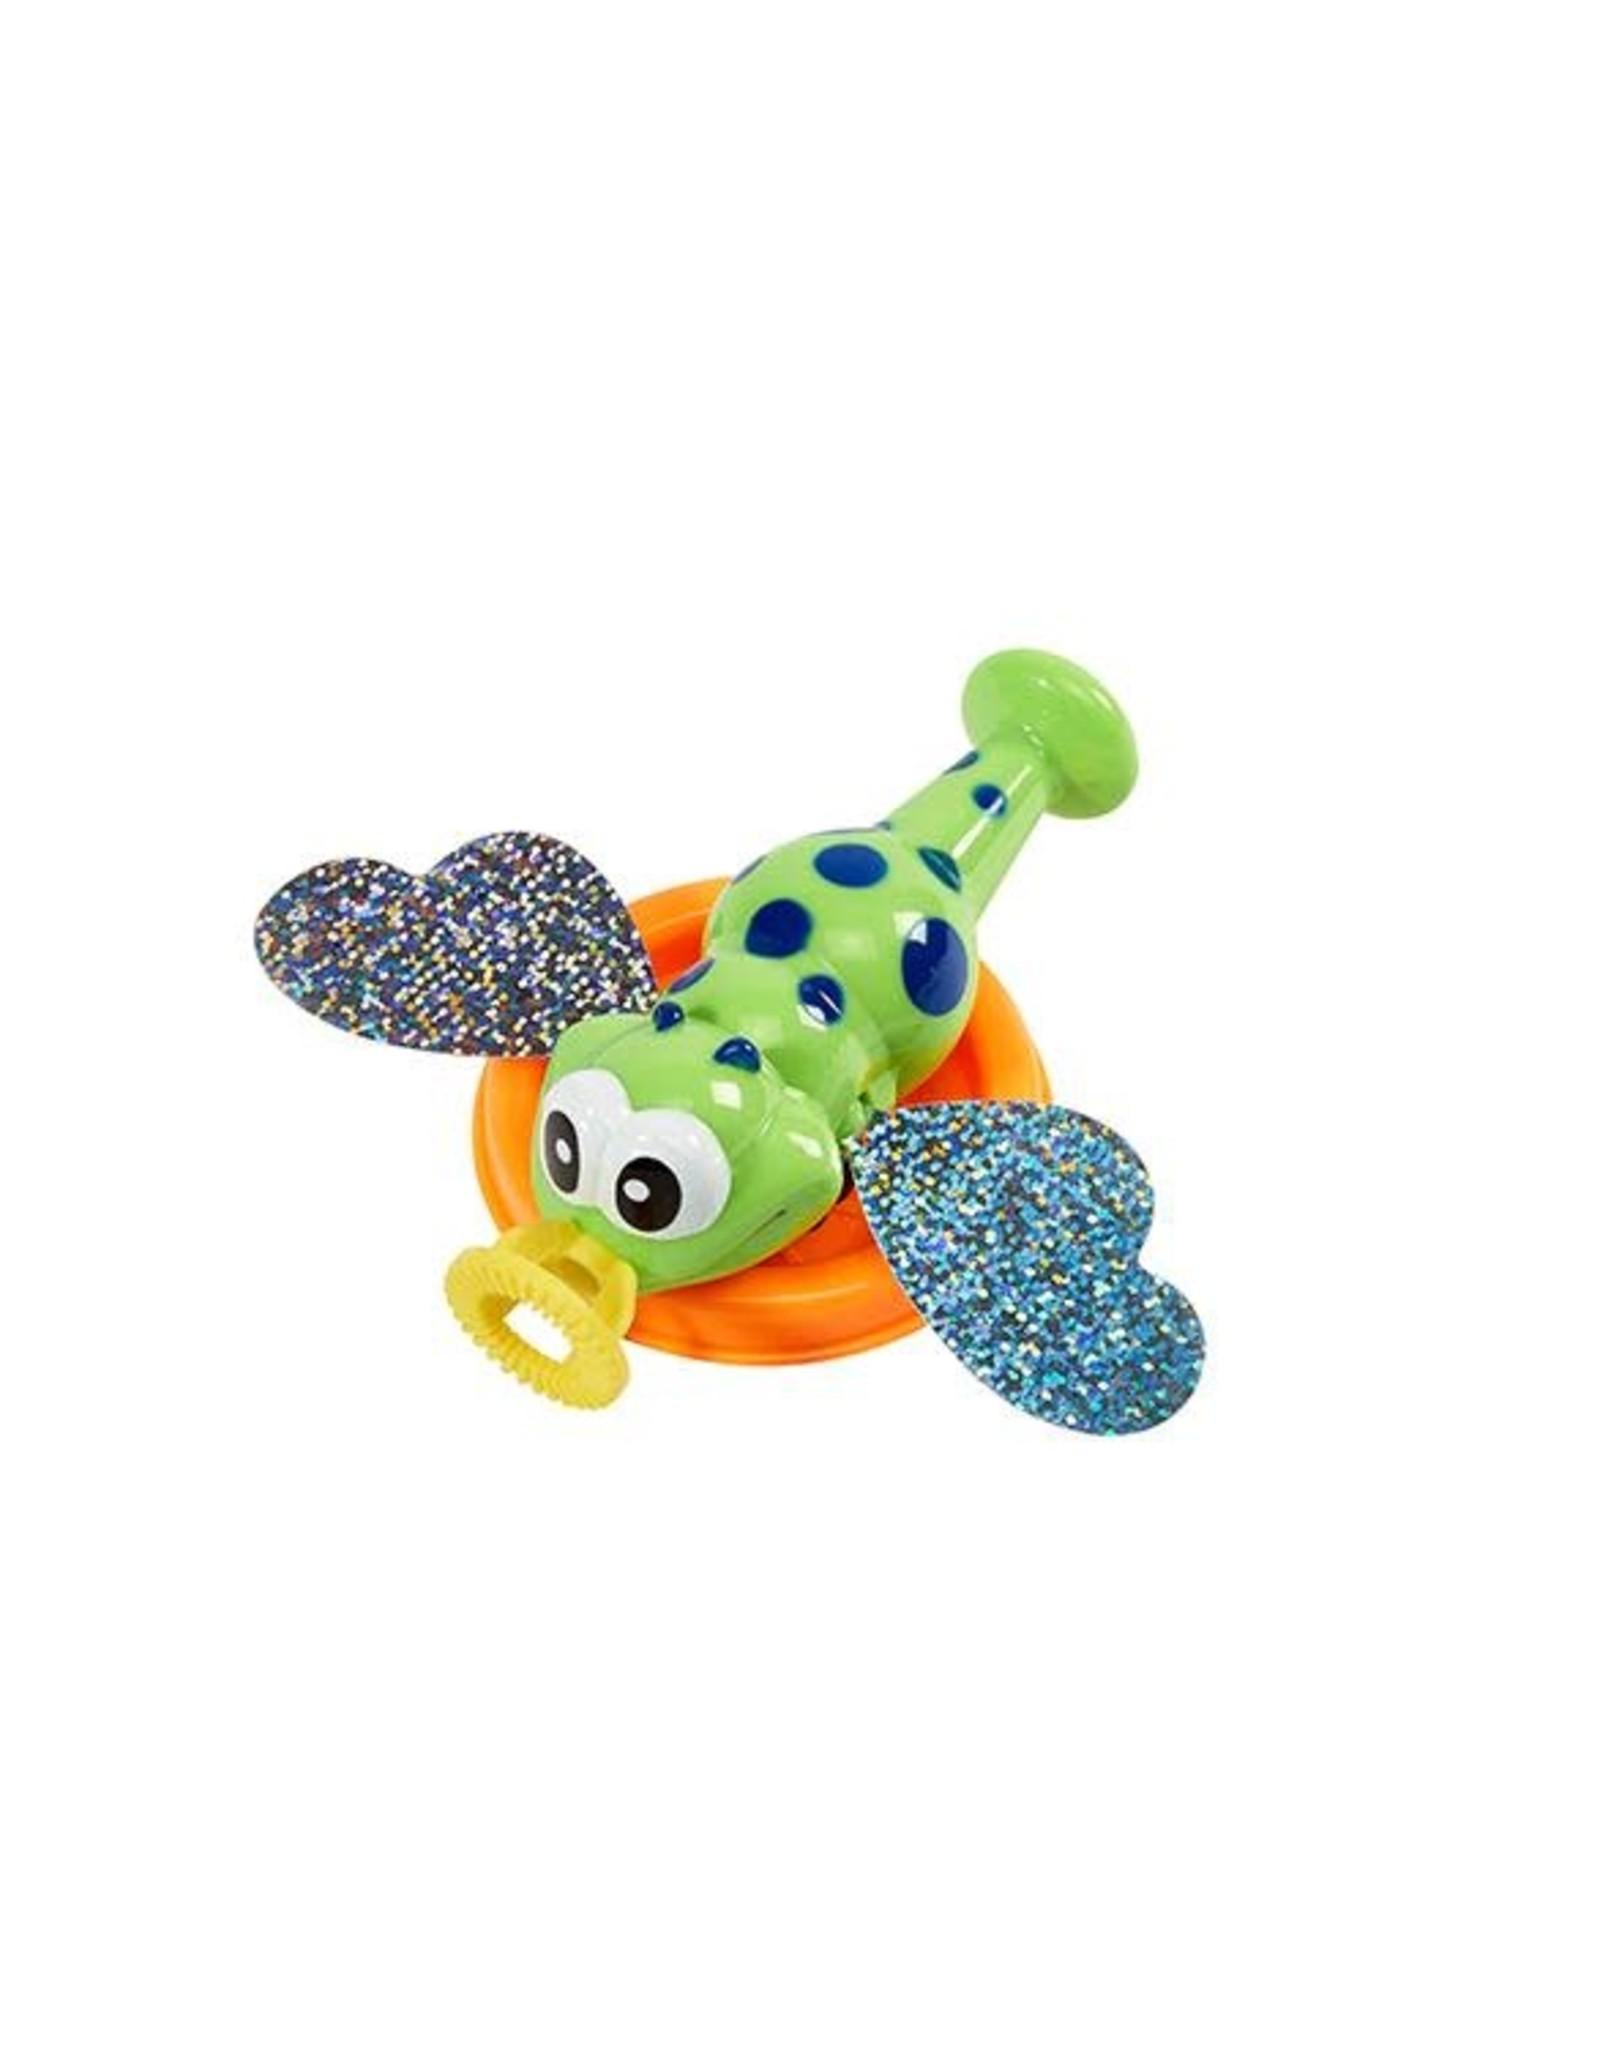 Little Kids Inc. Fubbles Bubblin' Glitter Bug